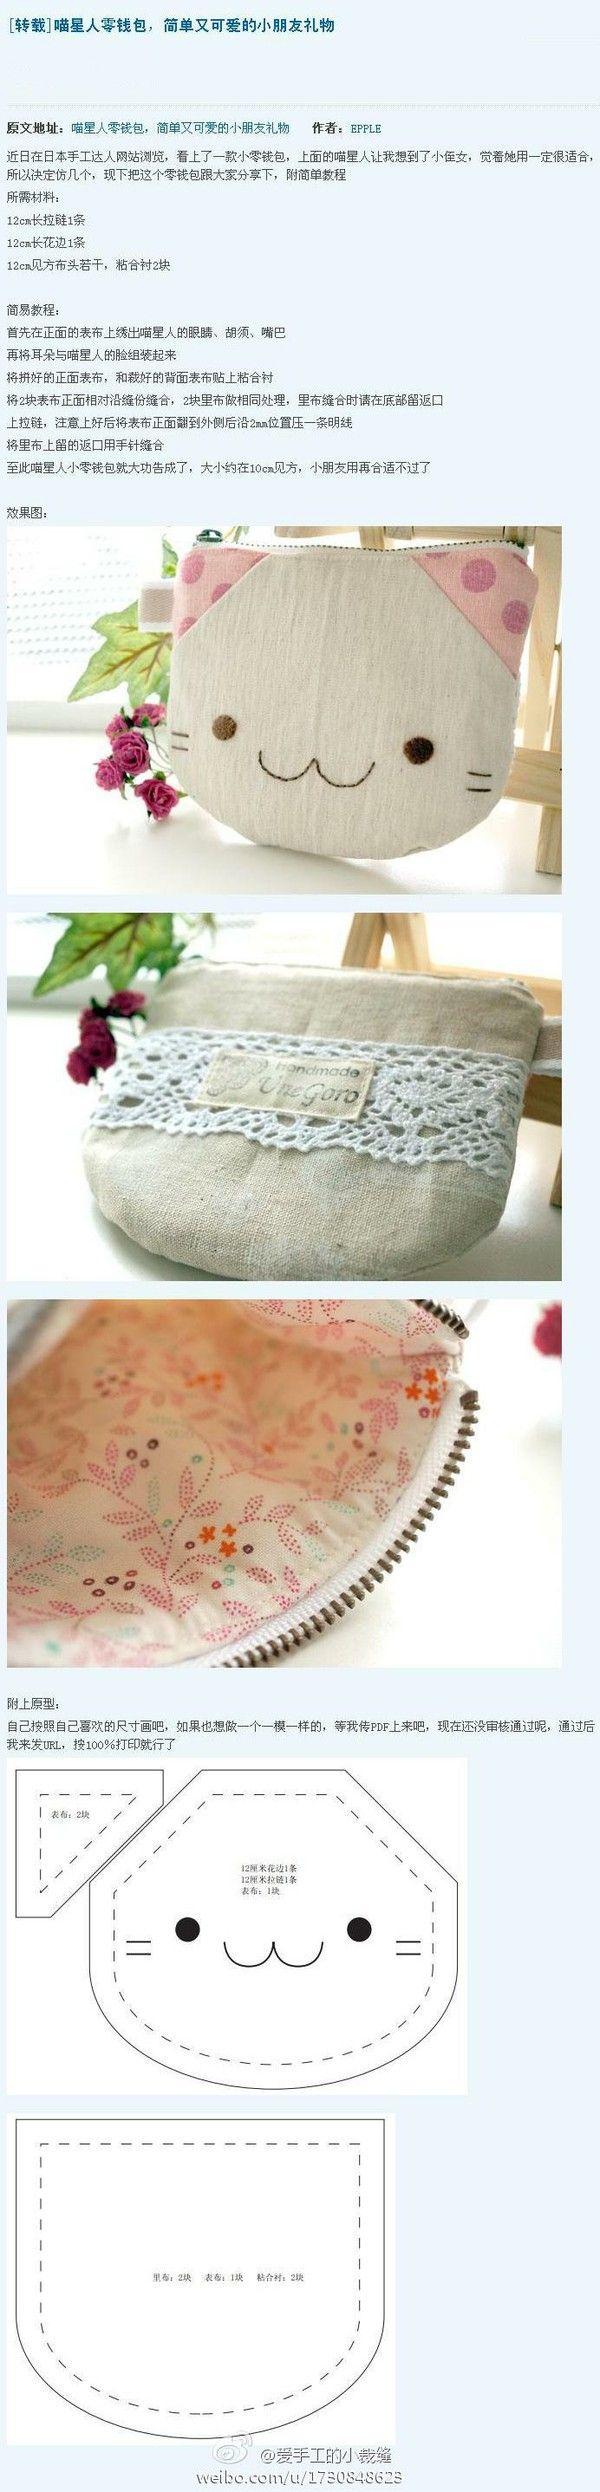 可爱的零钱包 Japanese sewing Craft Kitty Pouch.